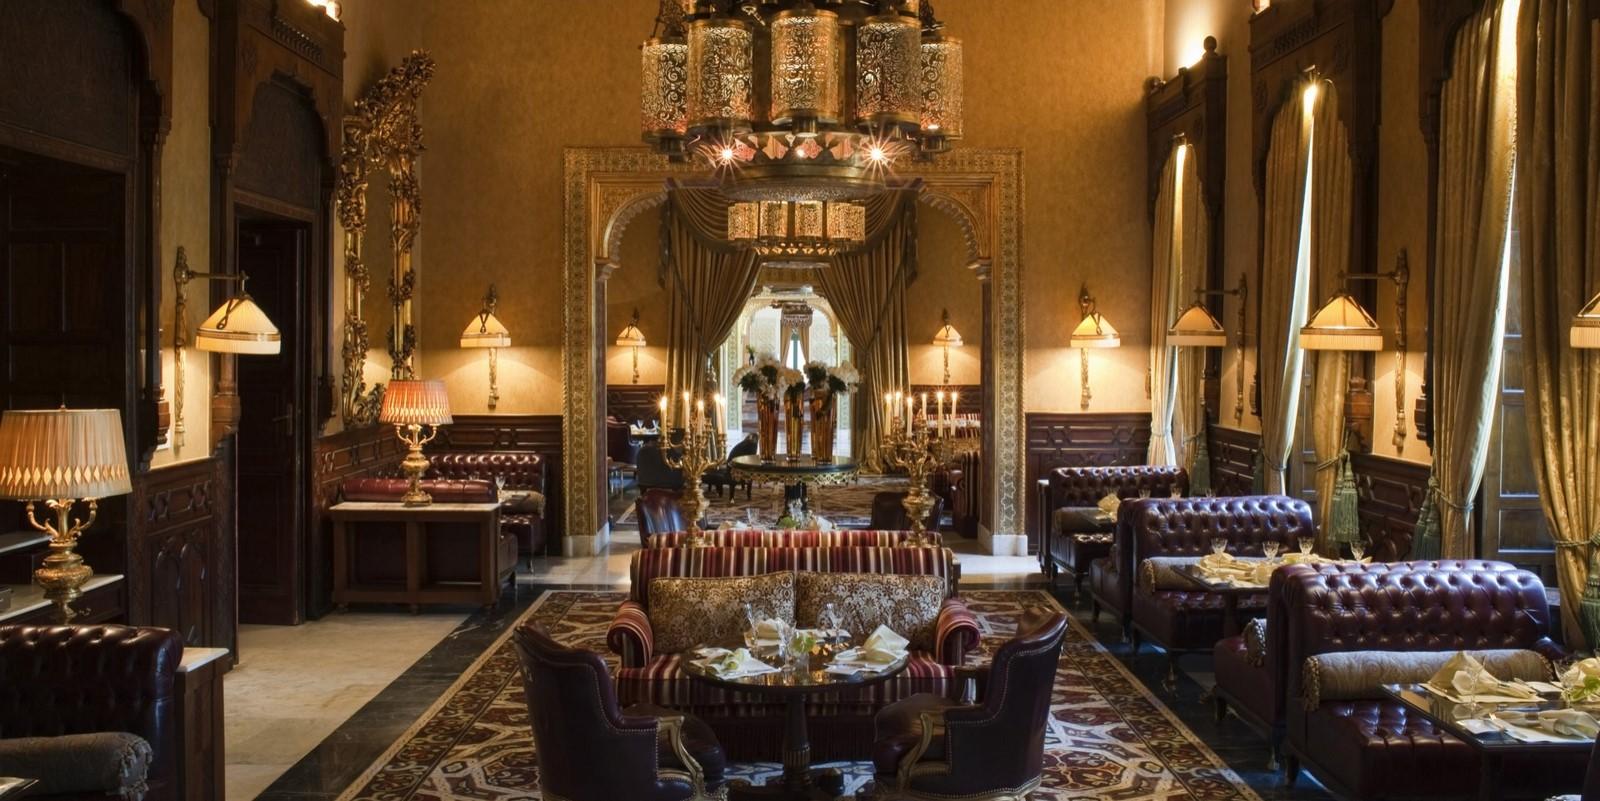 A look at Marriott Hotel's Interiors - Sheet4